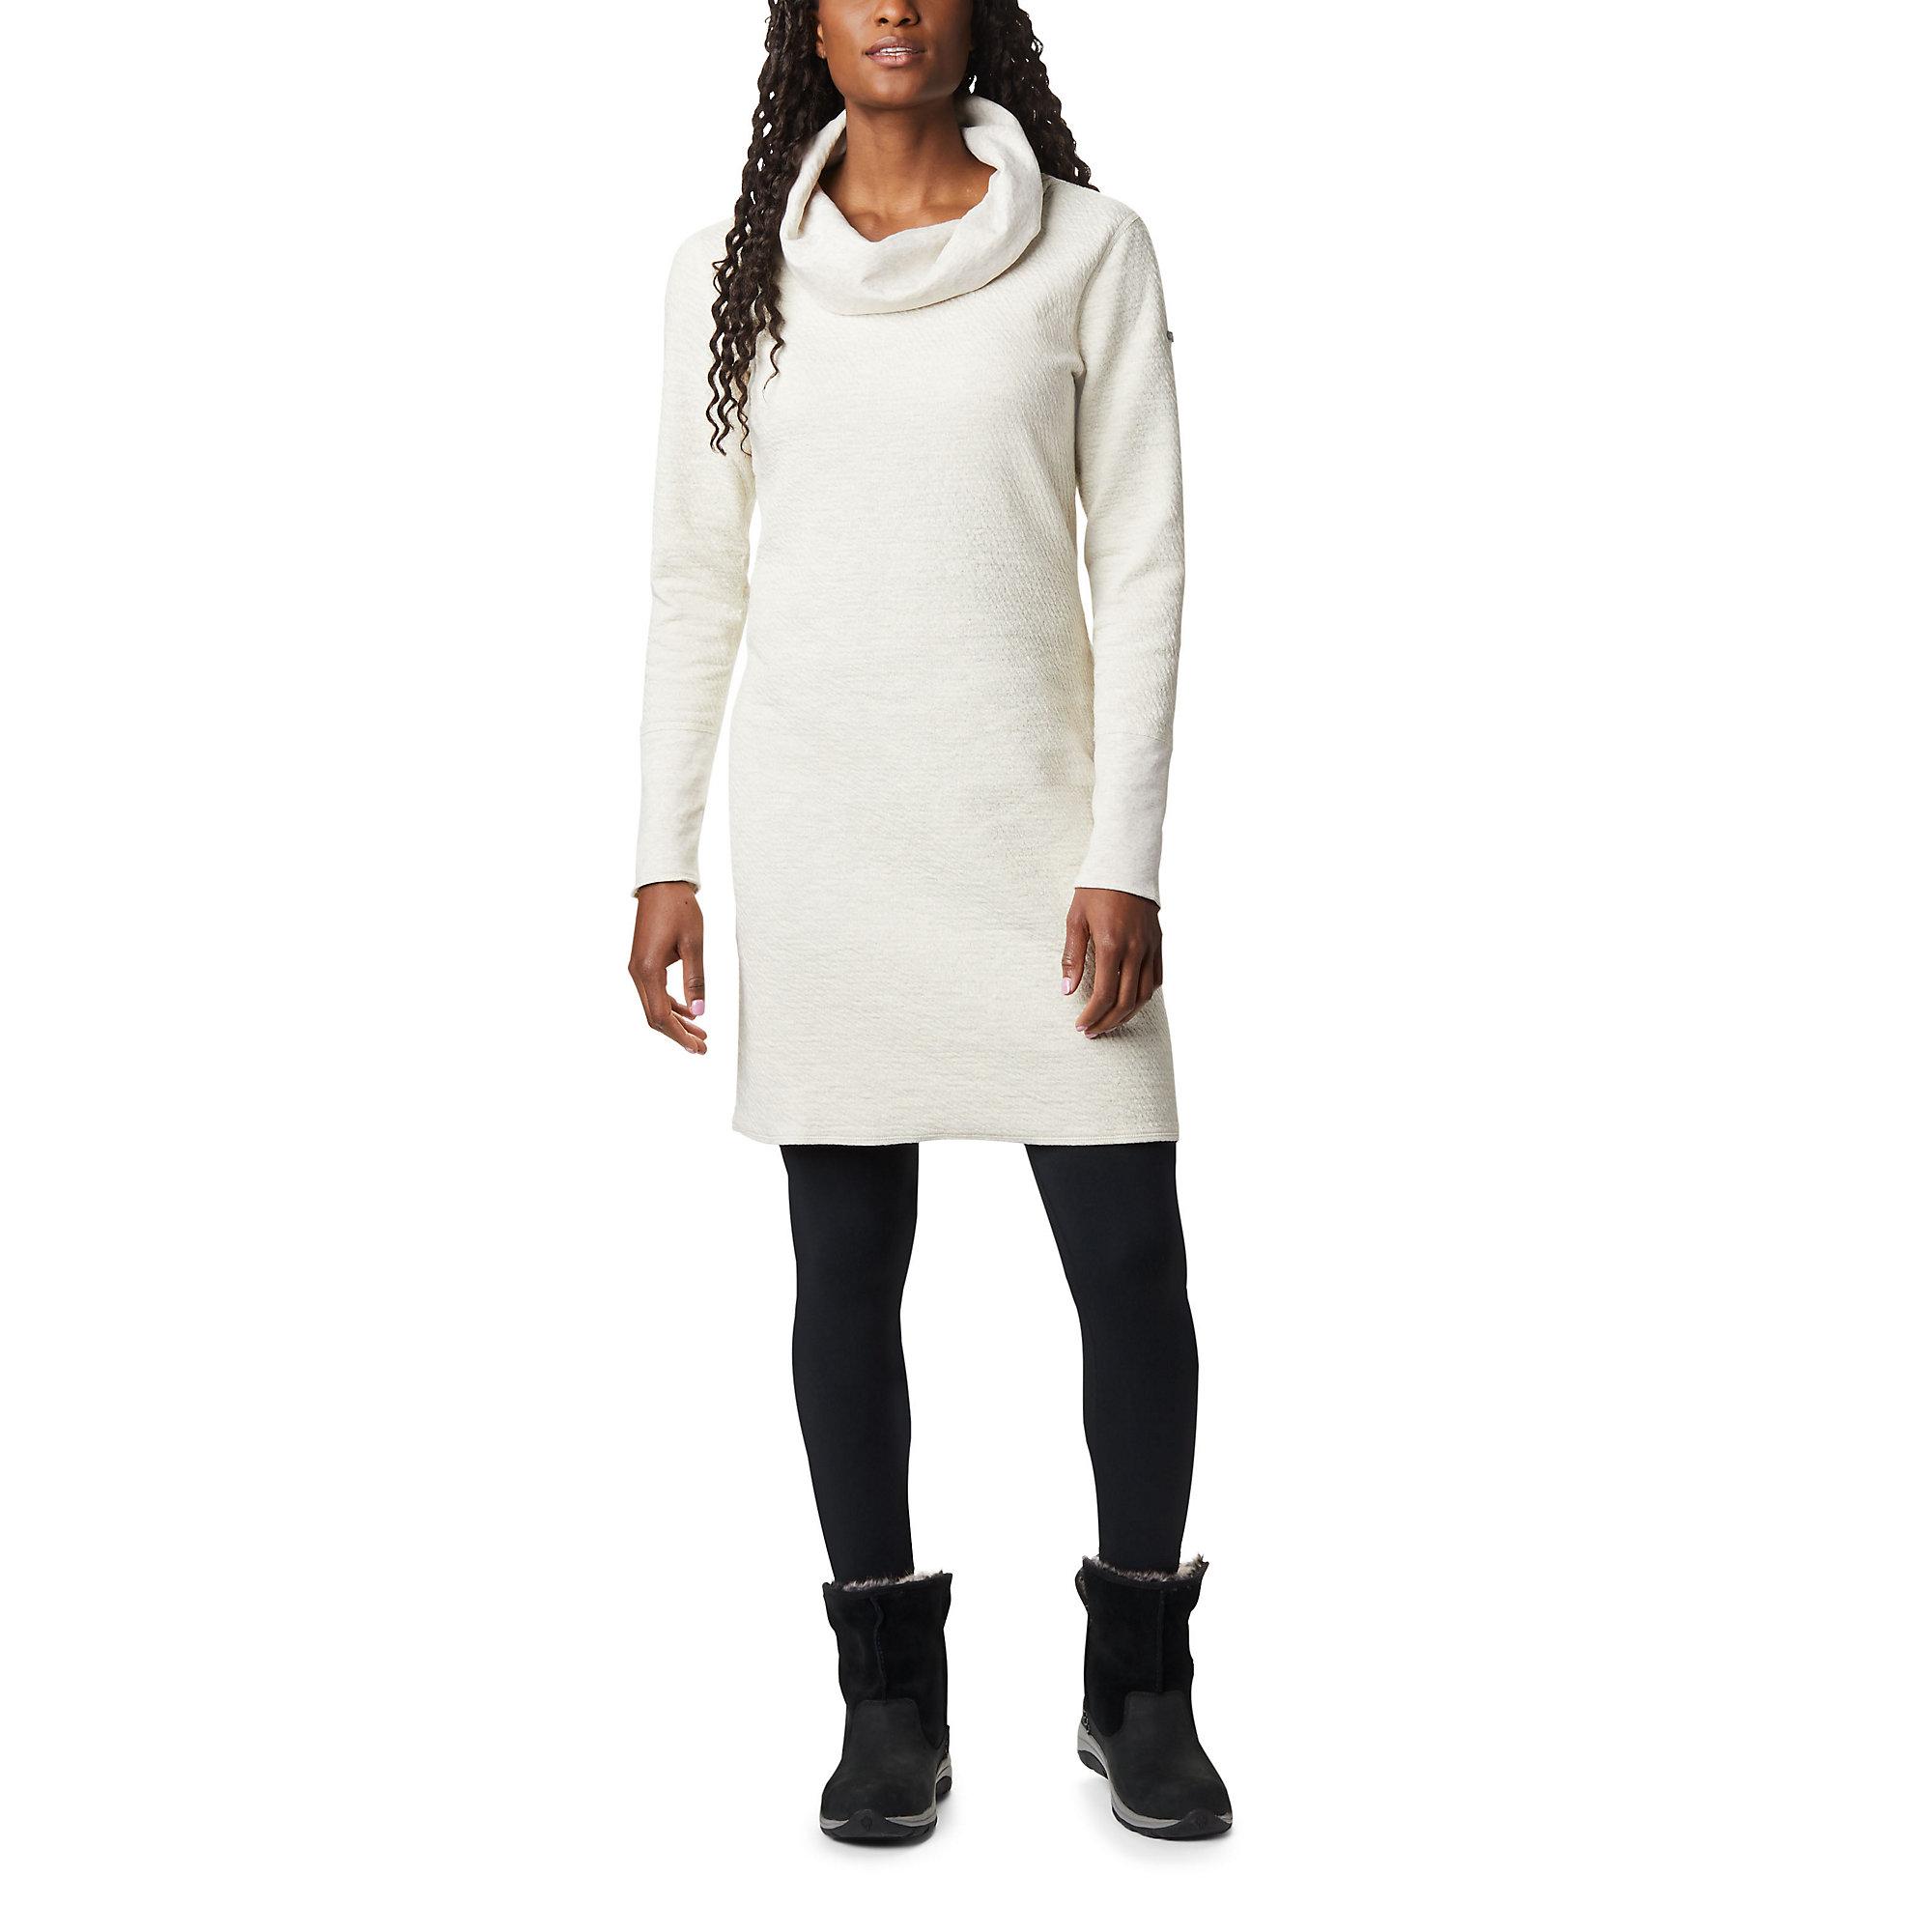 Columbia Winter Dream  Reversible Dress  106  M- 191455130166